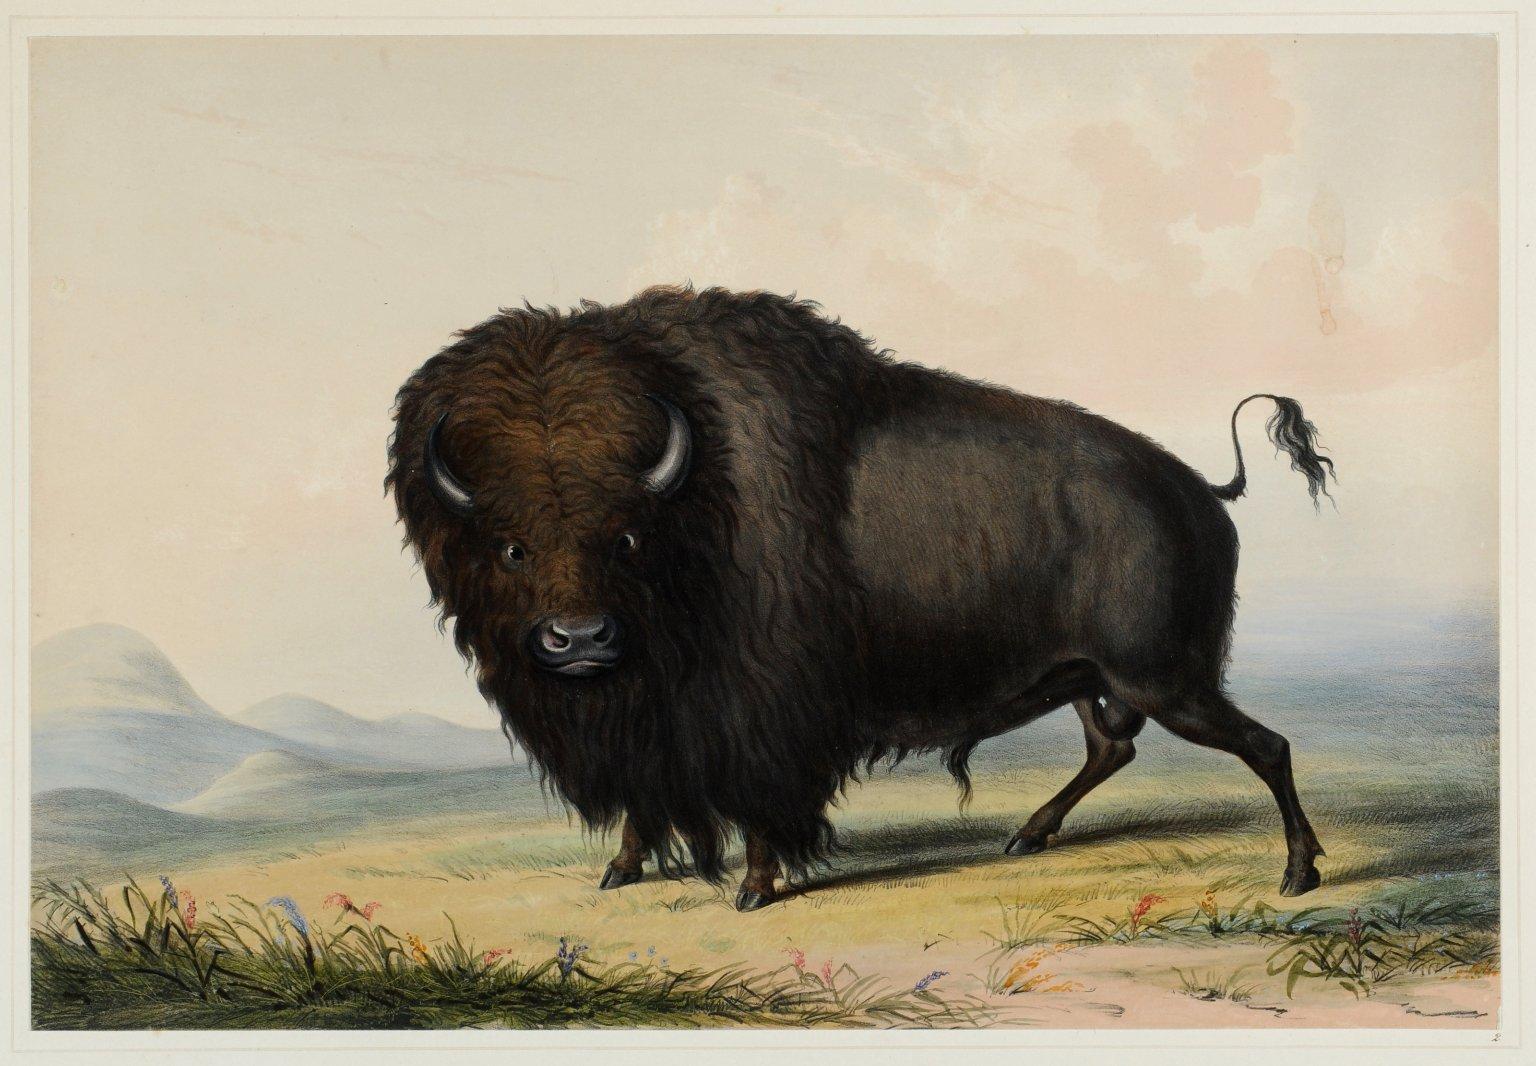 The American Buffalo.